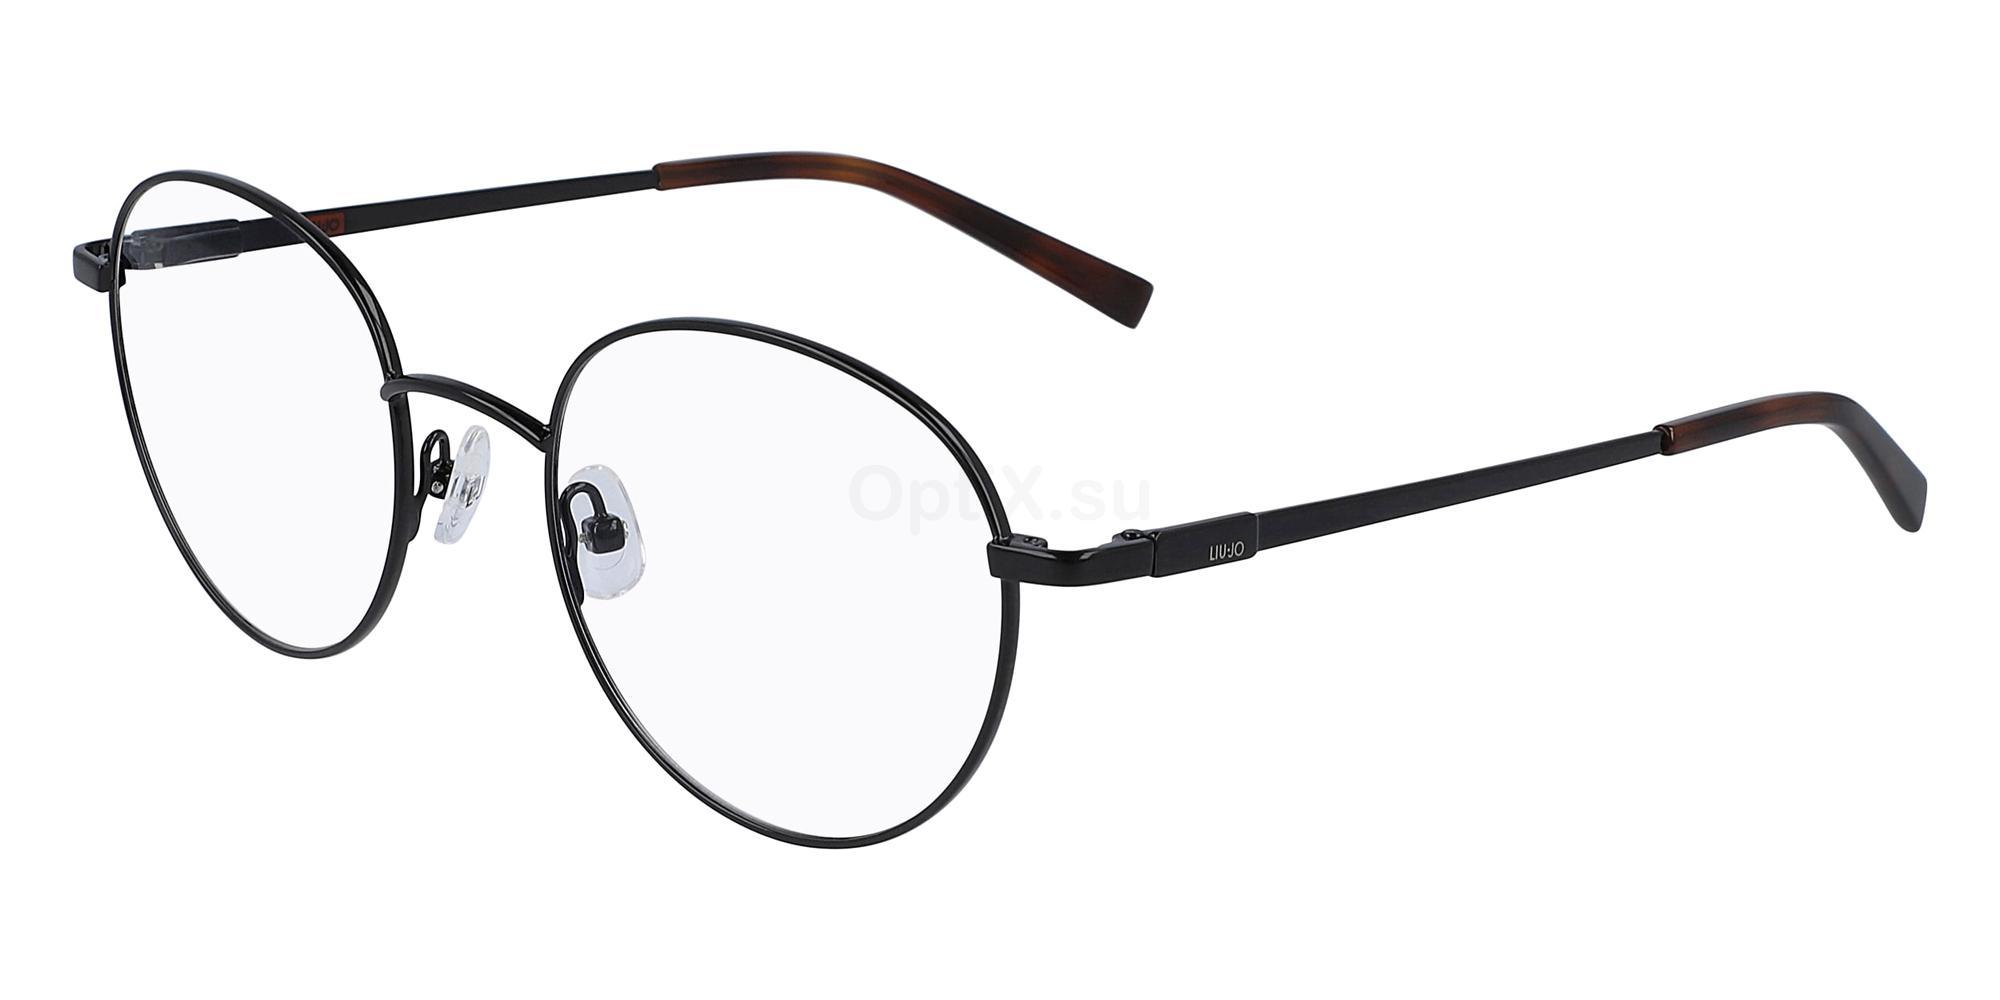 001 LJ2130 Glasses, Liu Jo